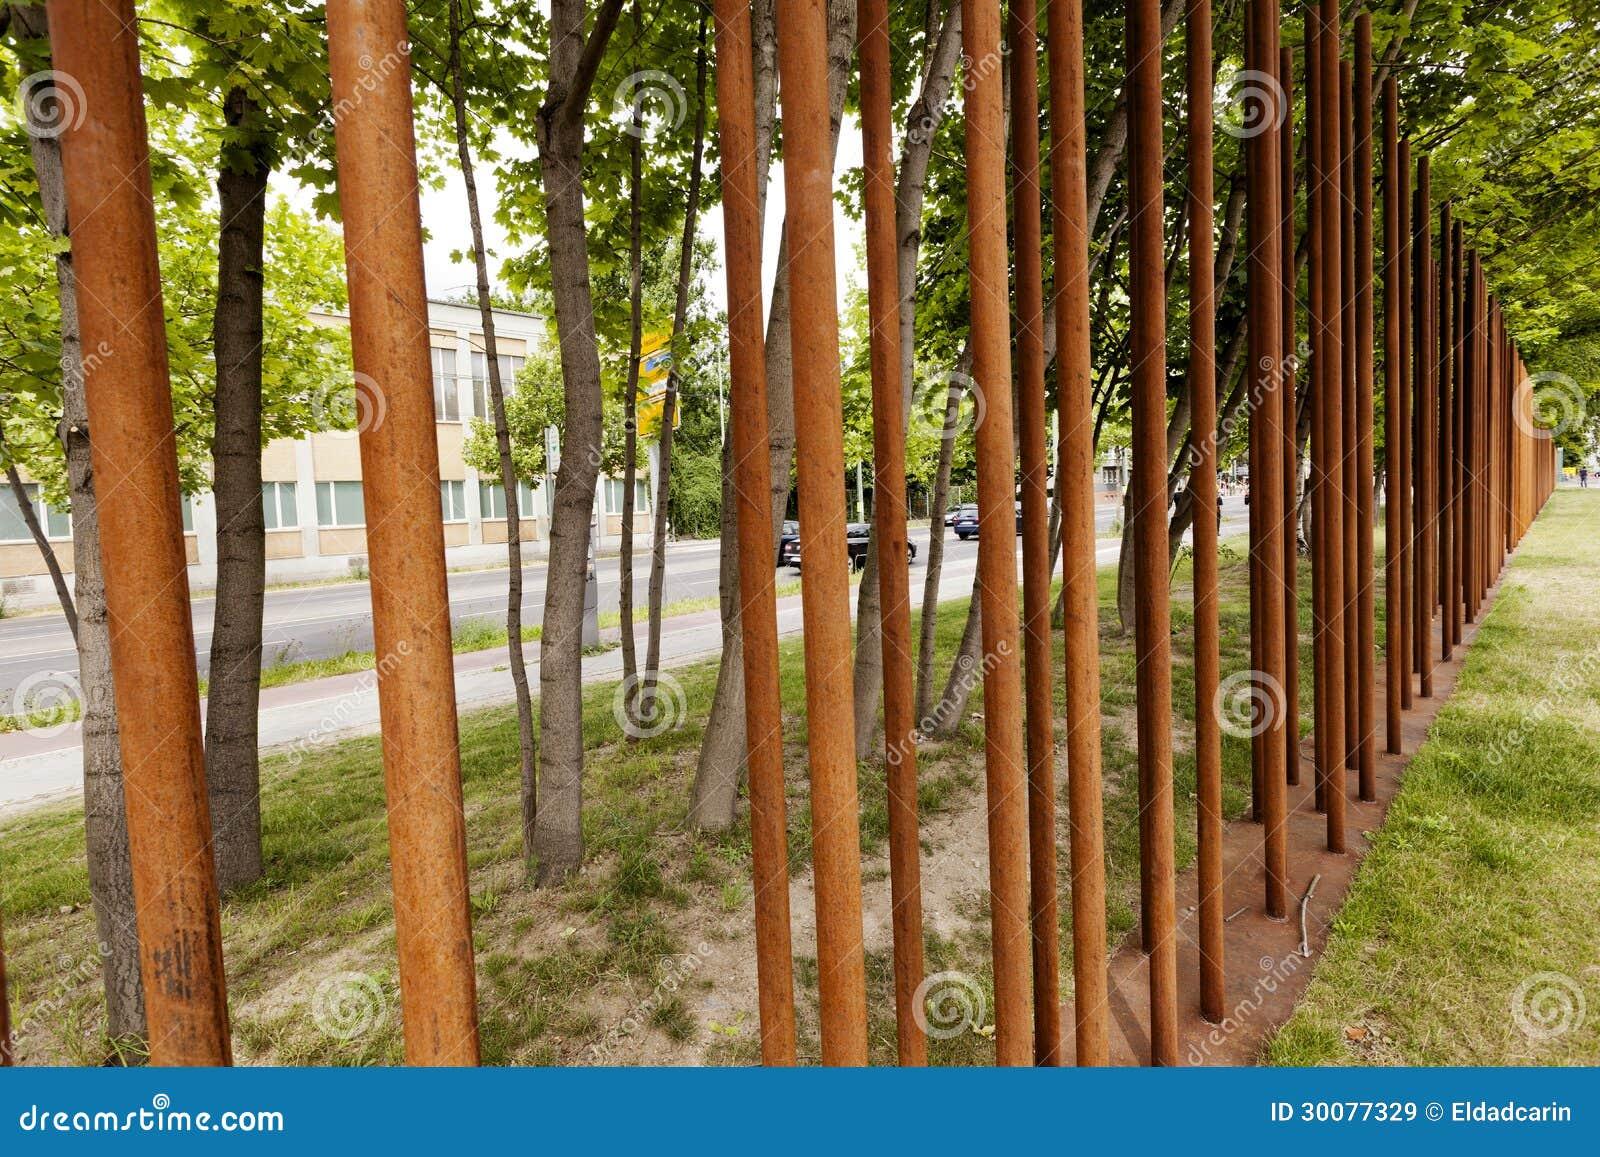 Berlin Wall Memorial Marking